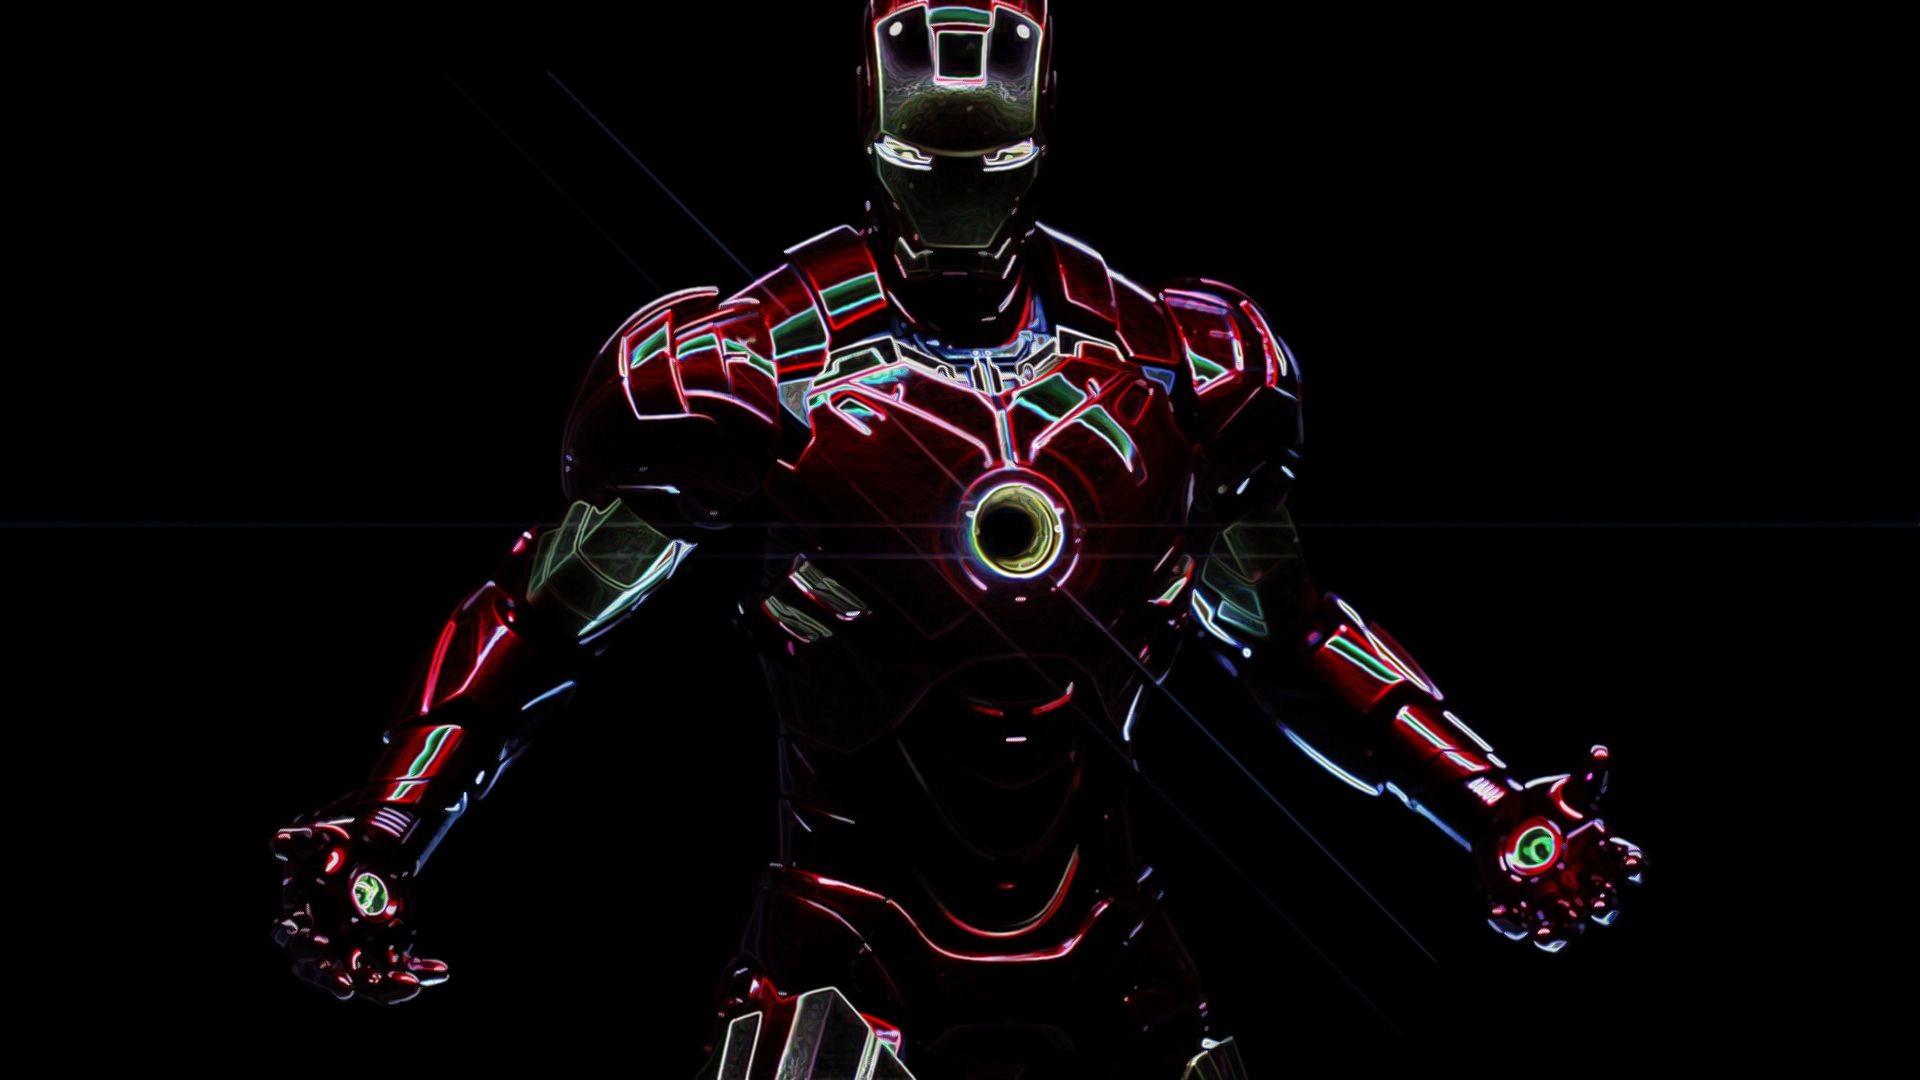 Iron Man Widescreen Background Wallpapers 7812 – HD Wallpaper Site